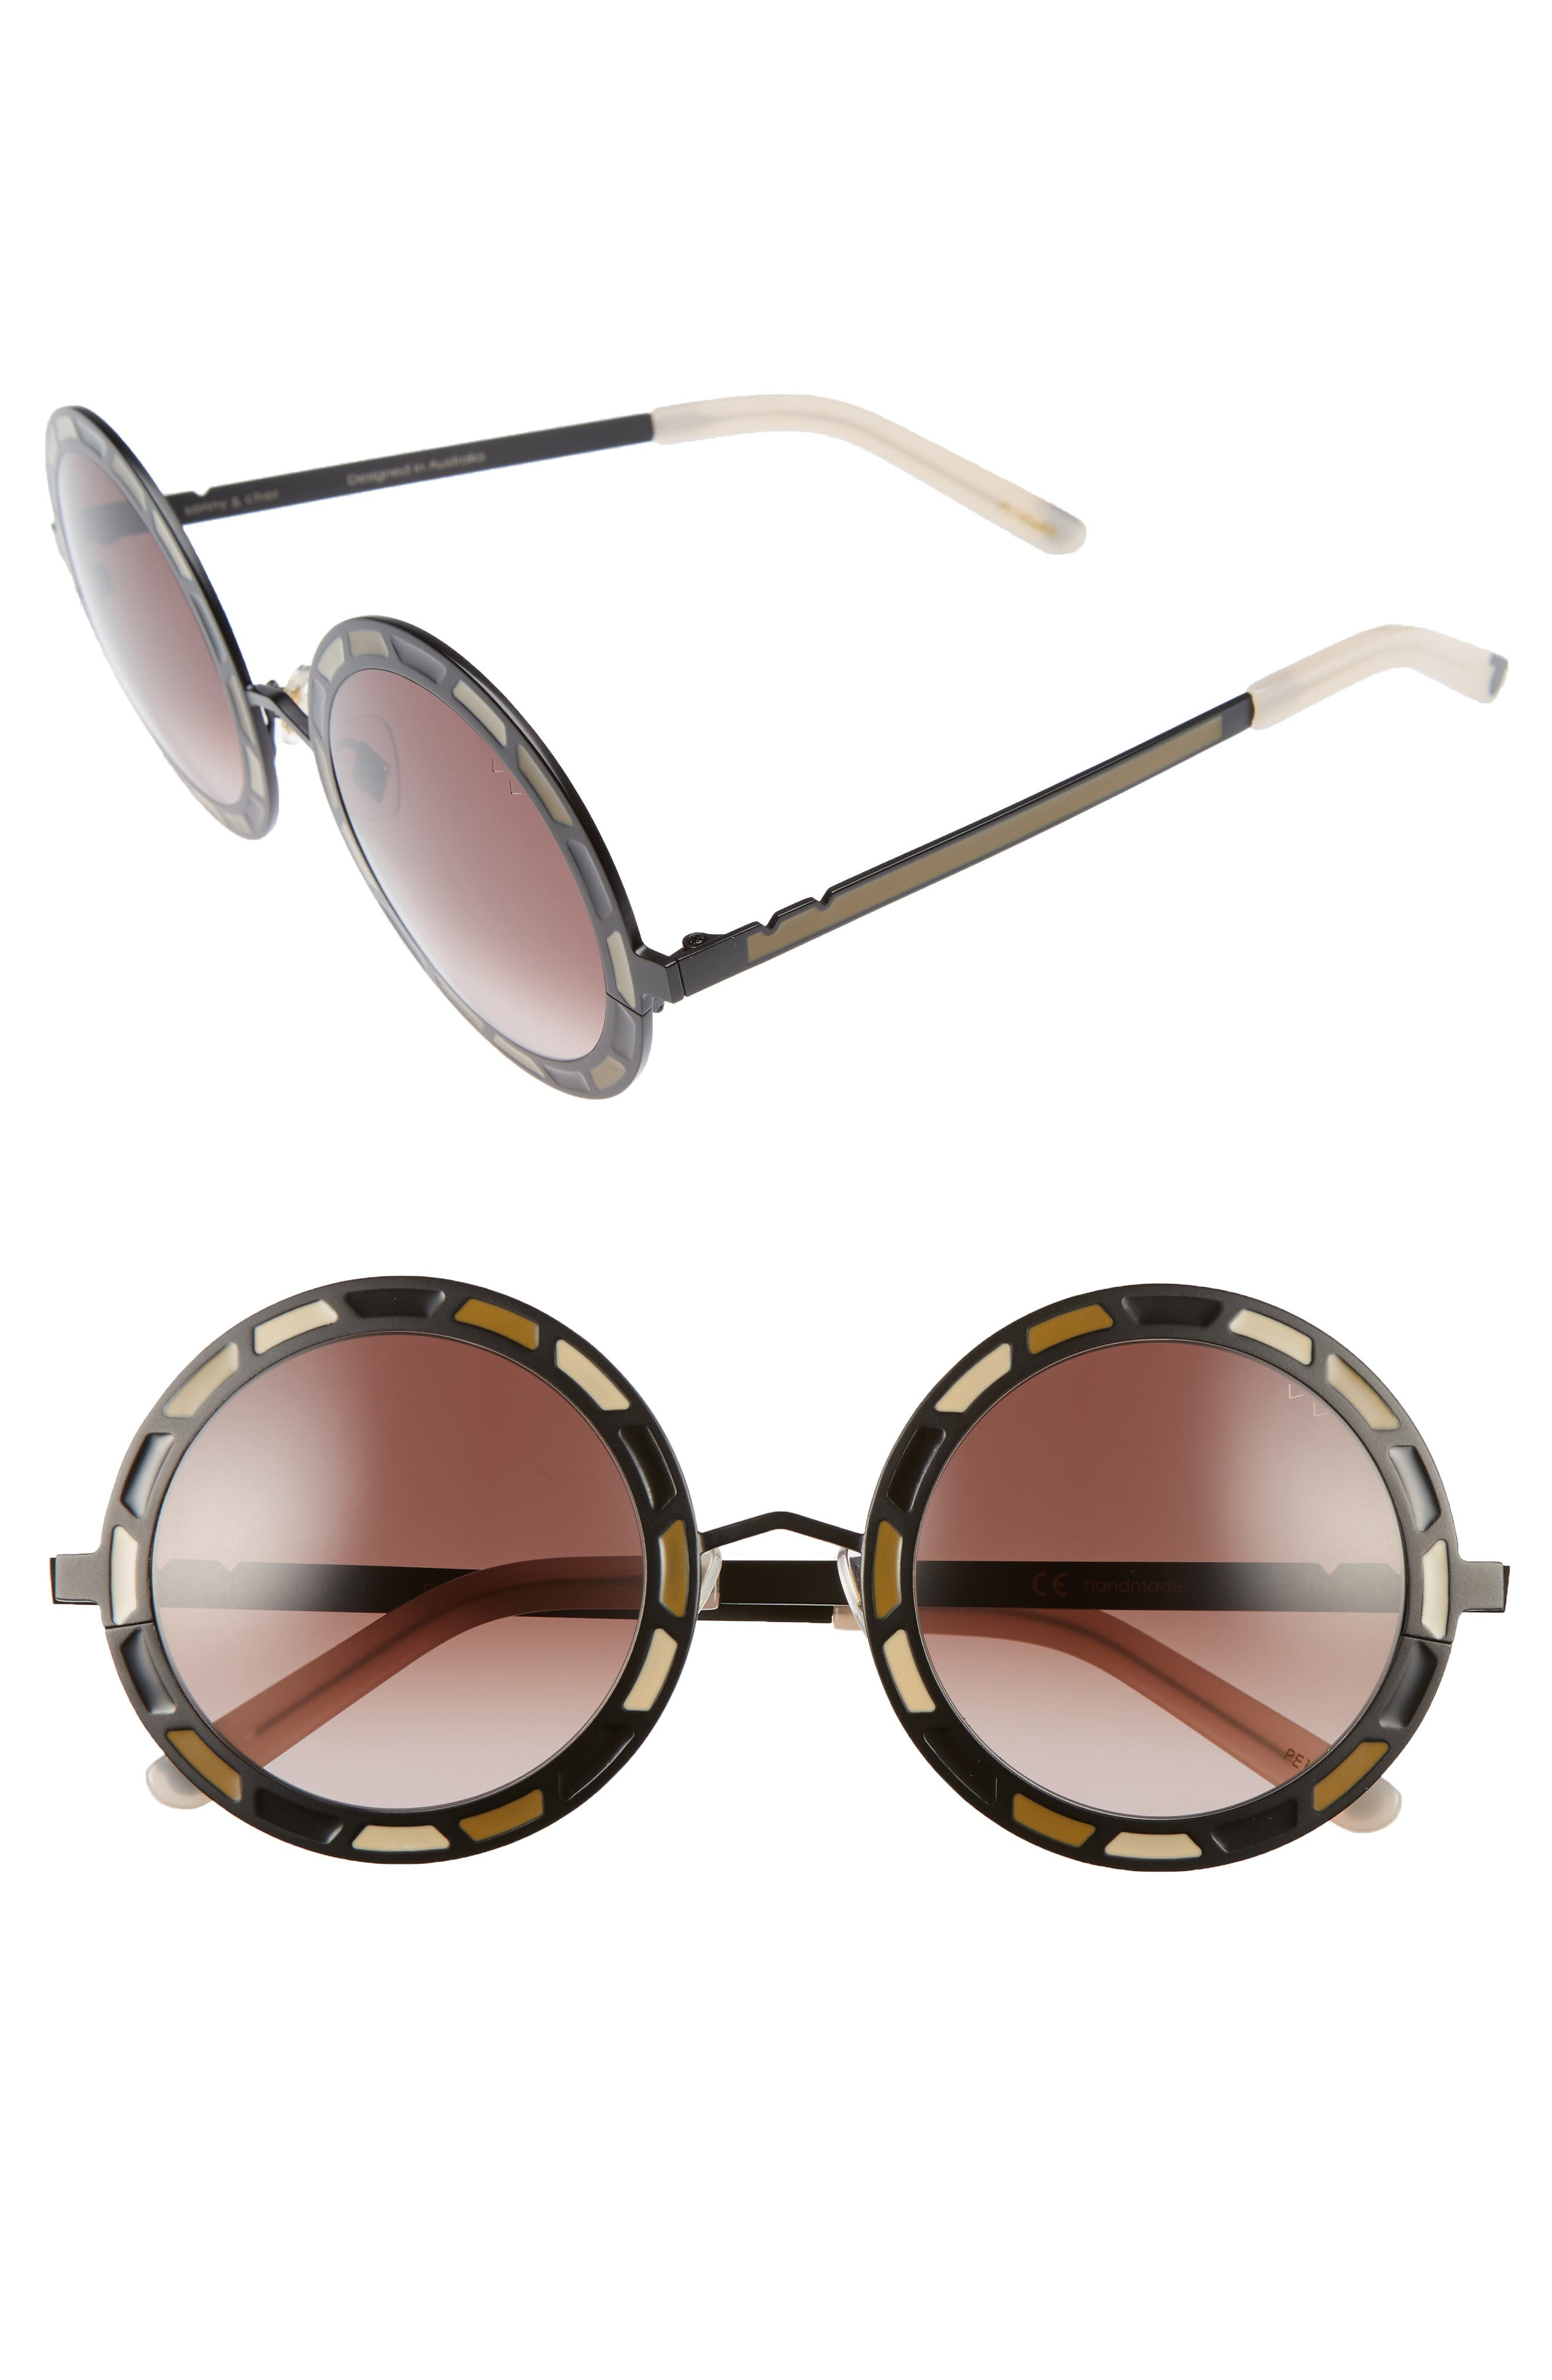 Sonny & Cher 50mm Round Sunglasses,                             Main thumbnail 1, color,                             001